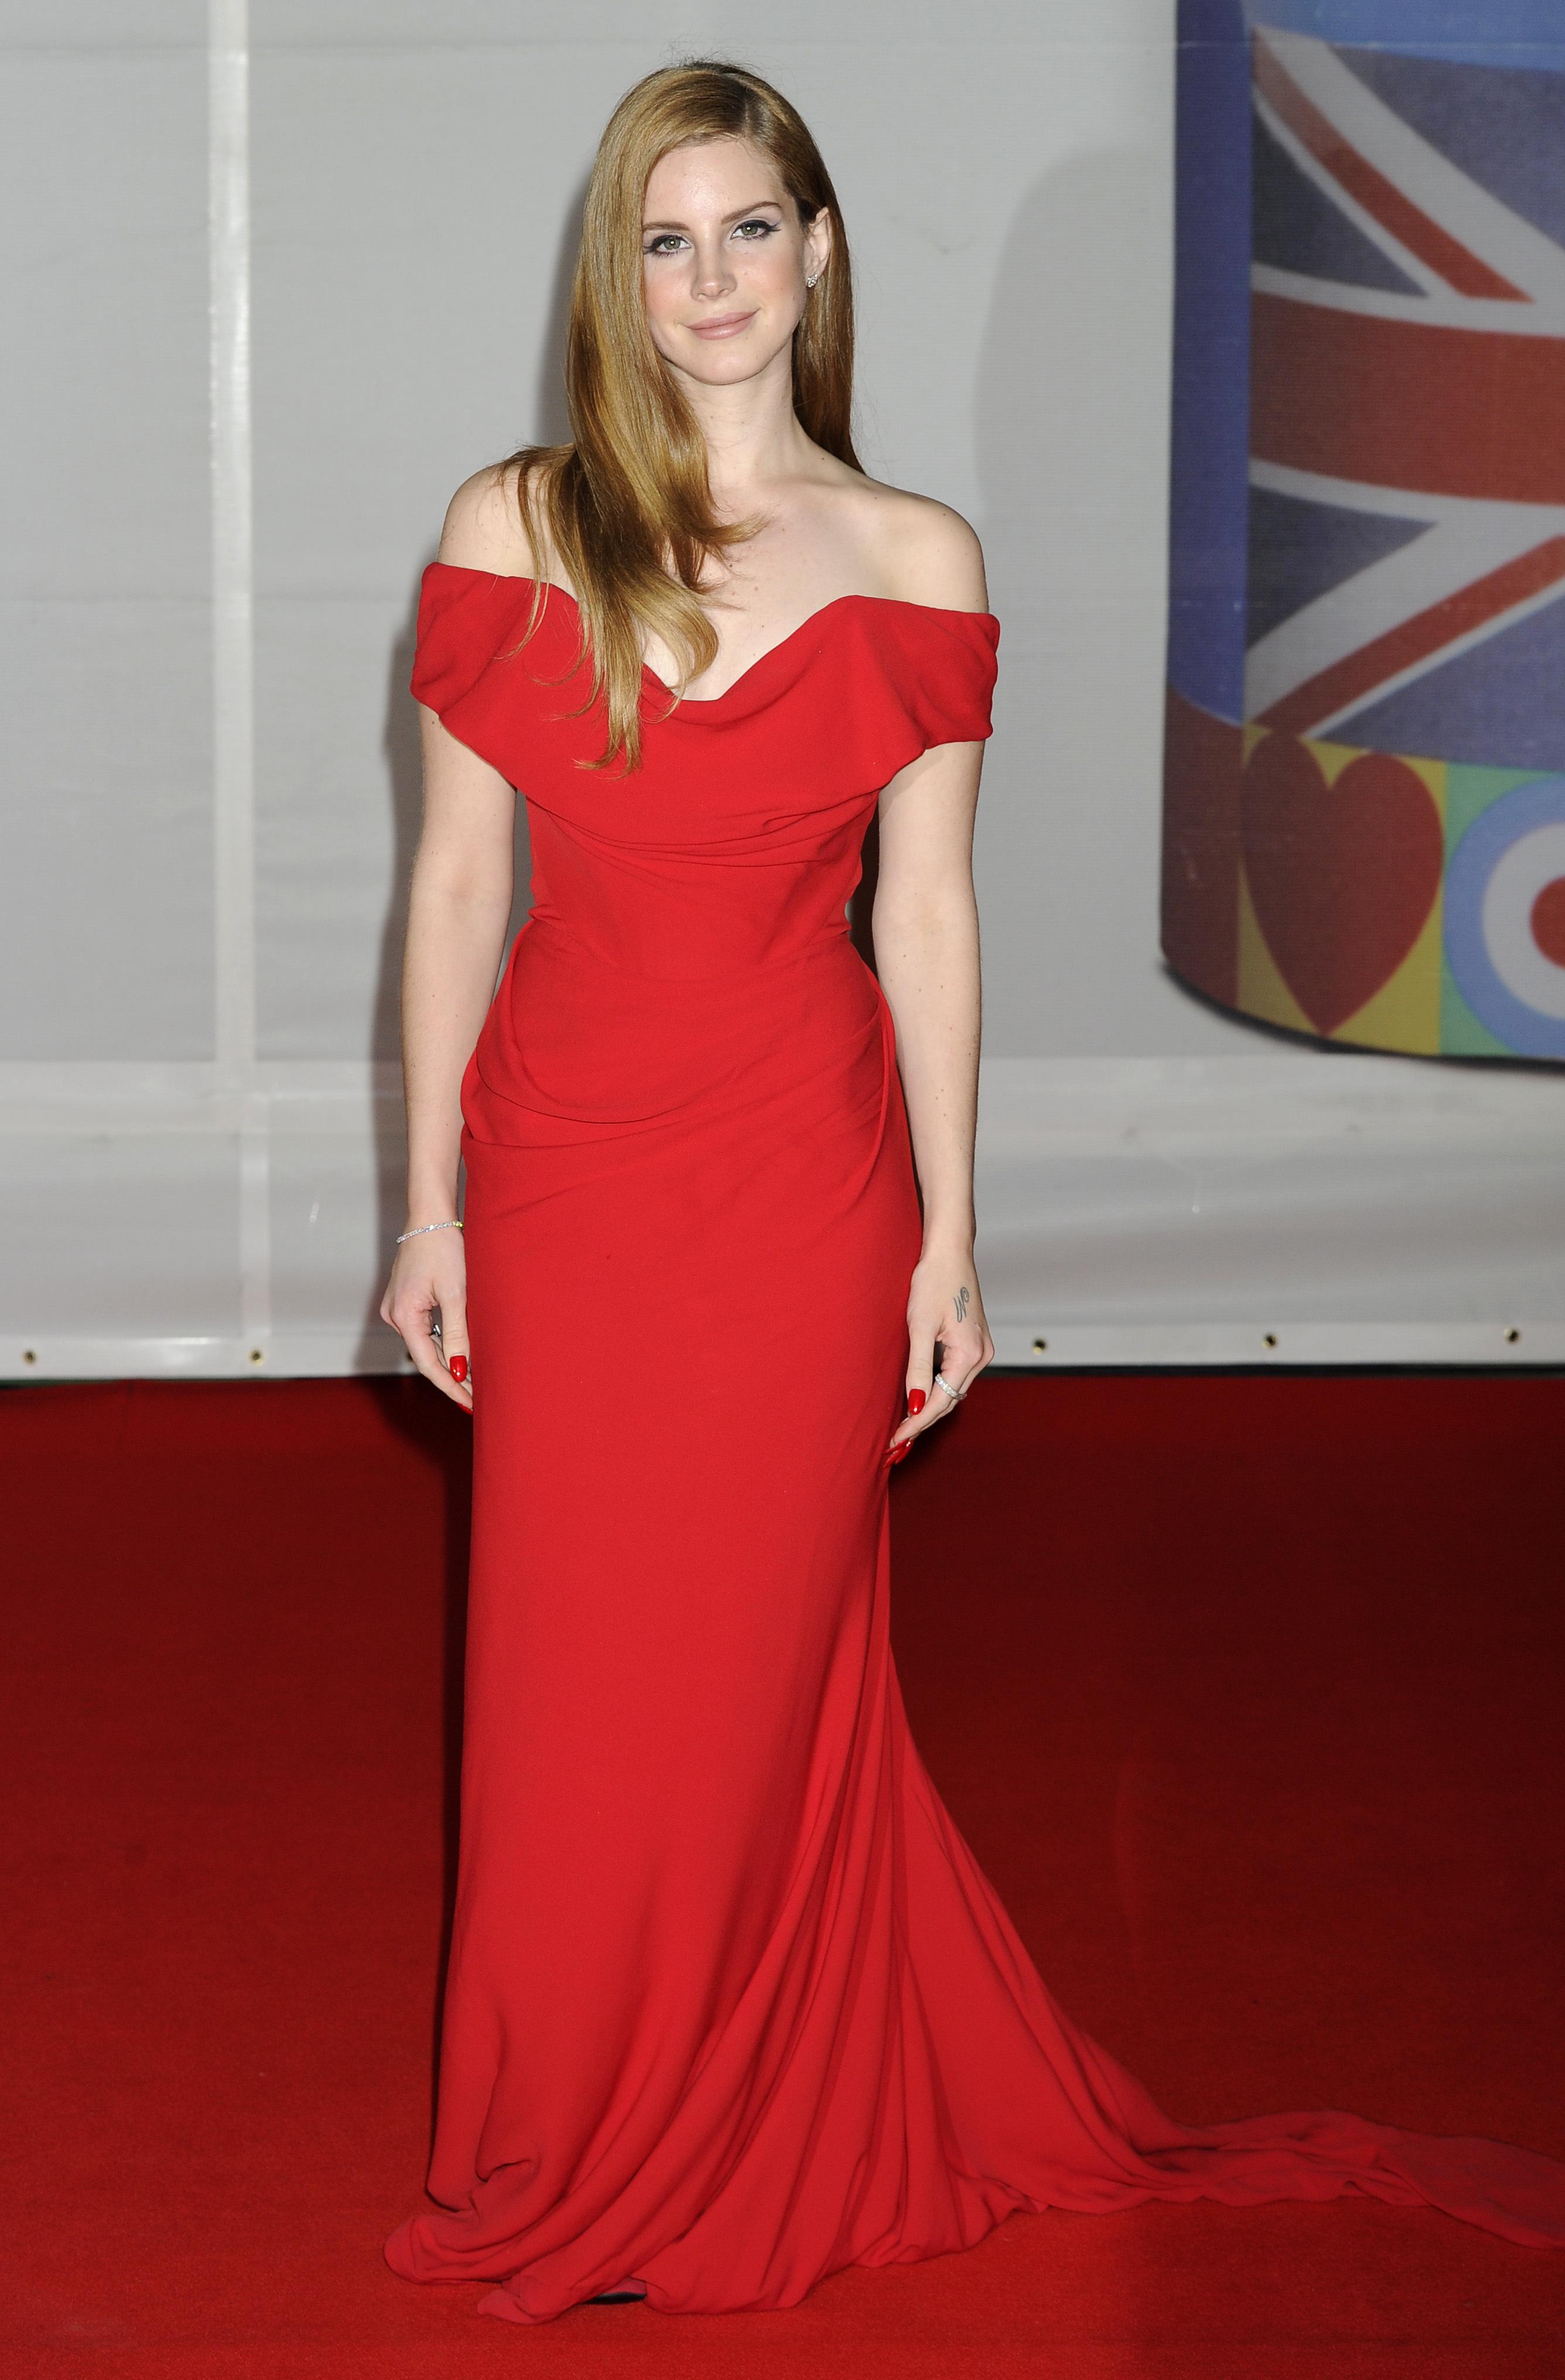 lana del rey red dress